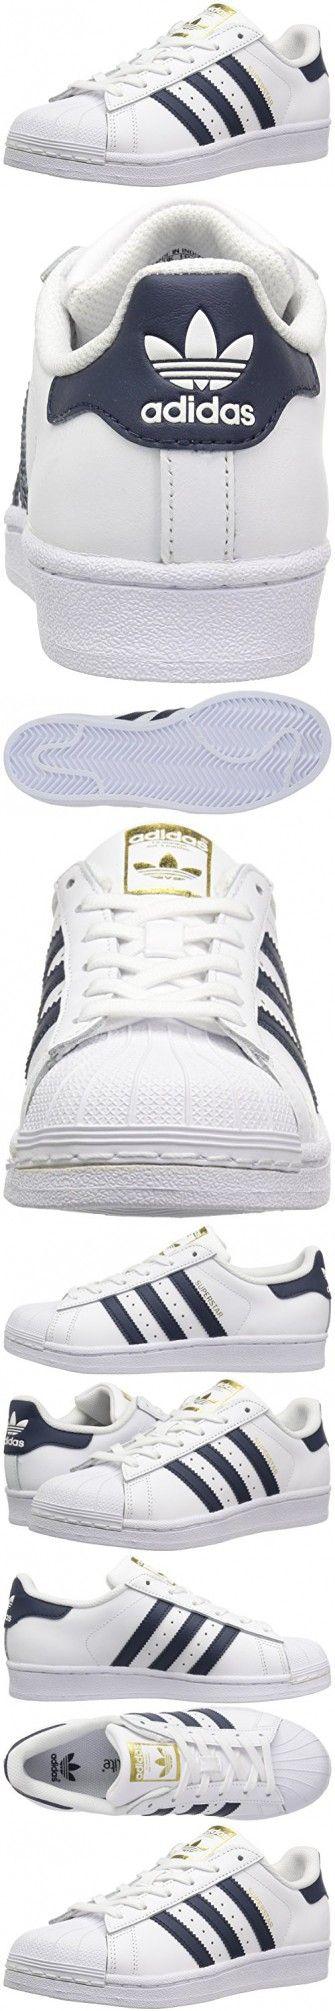 Adidas Originals Boys' Superstar Foundation J Sneaker, White/Collegiate Navy/Metallic/Gold, 5 M US Big Kid